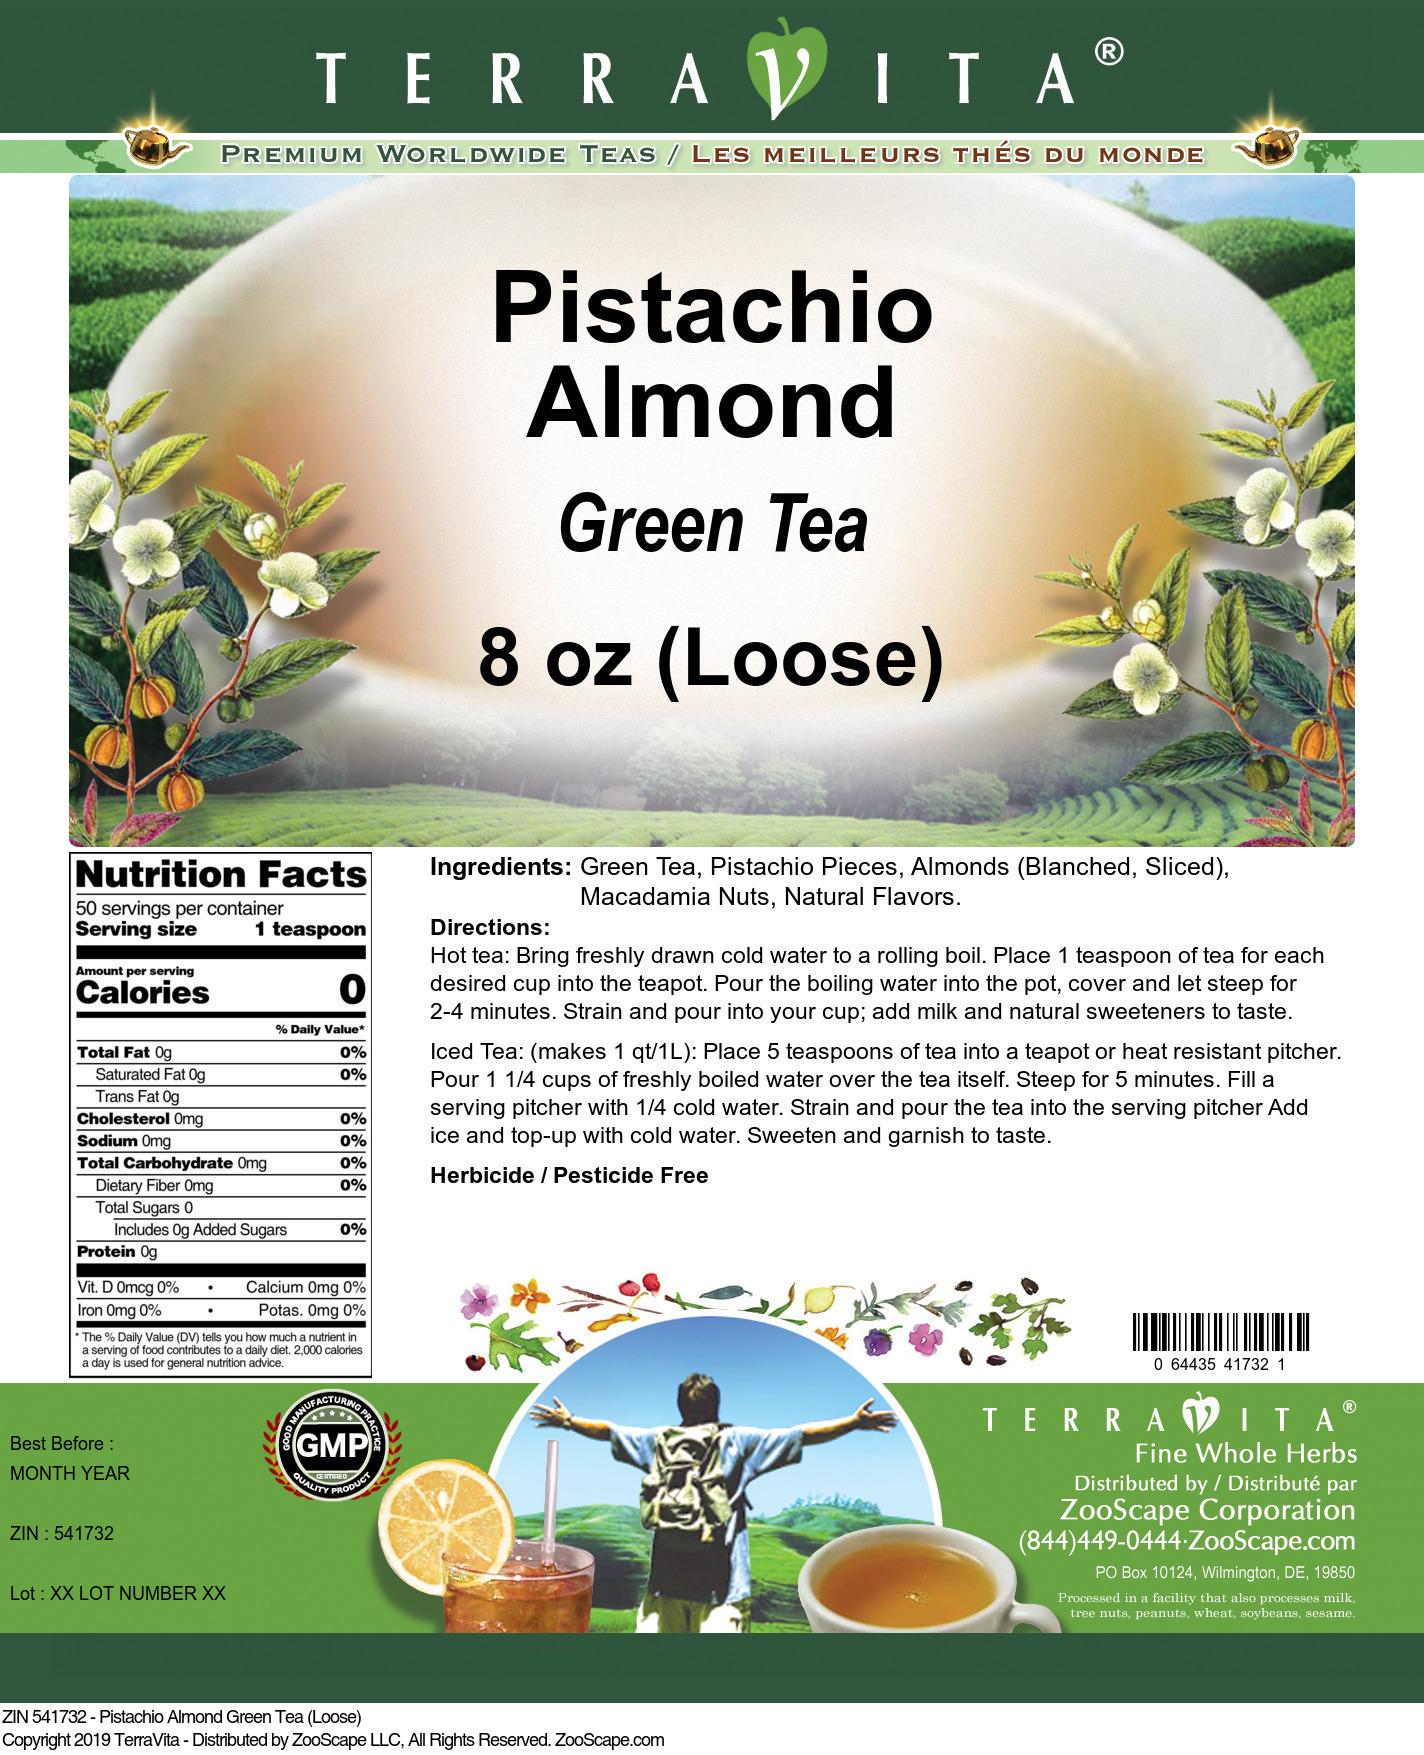 Pistachio Almond Green Tea (Loose)